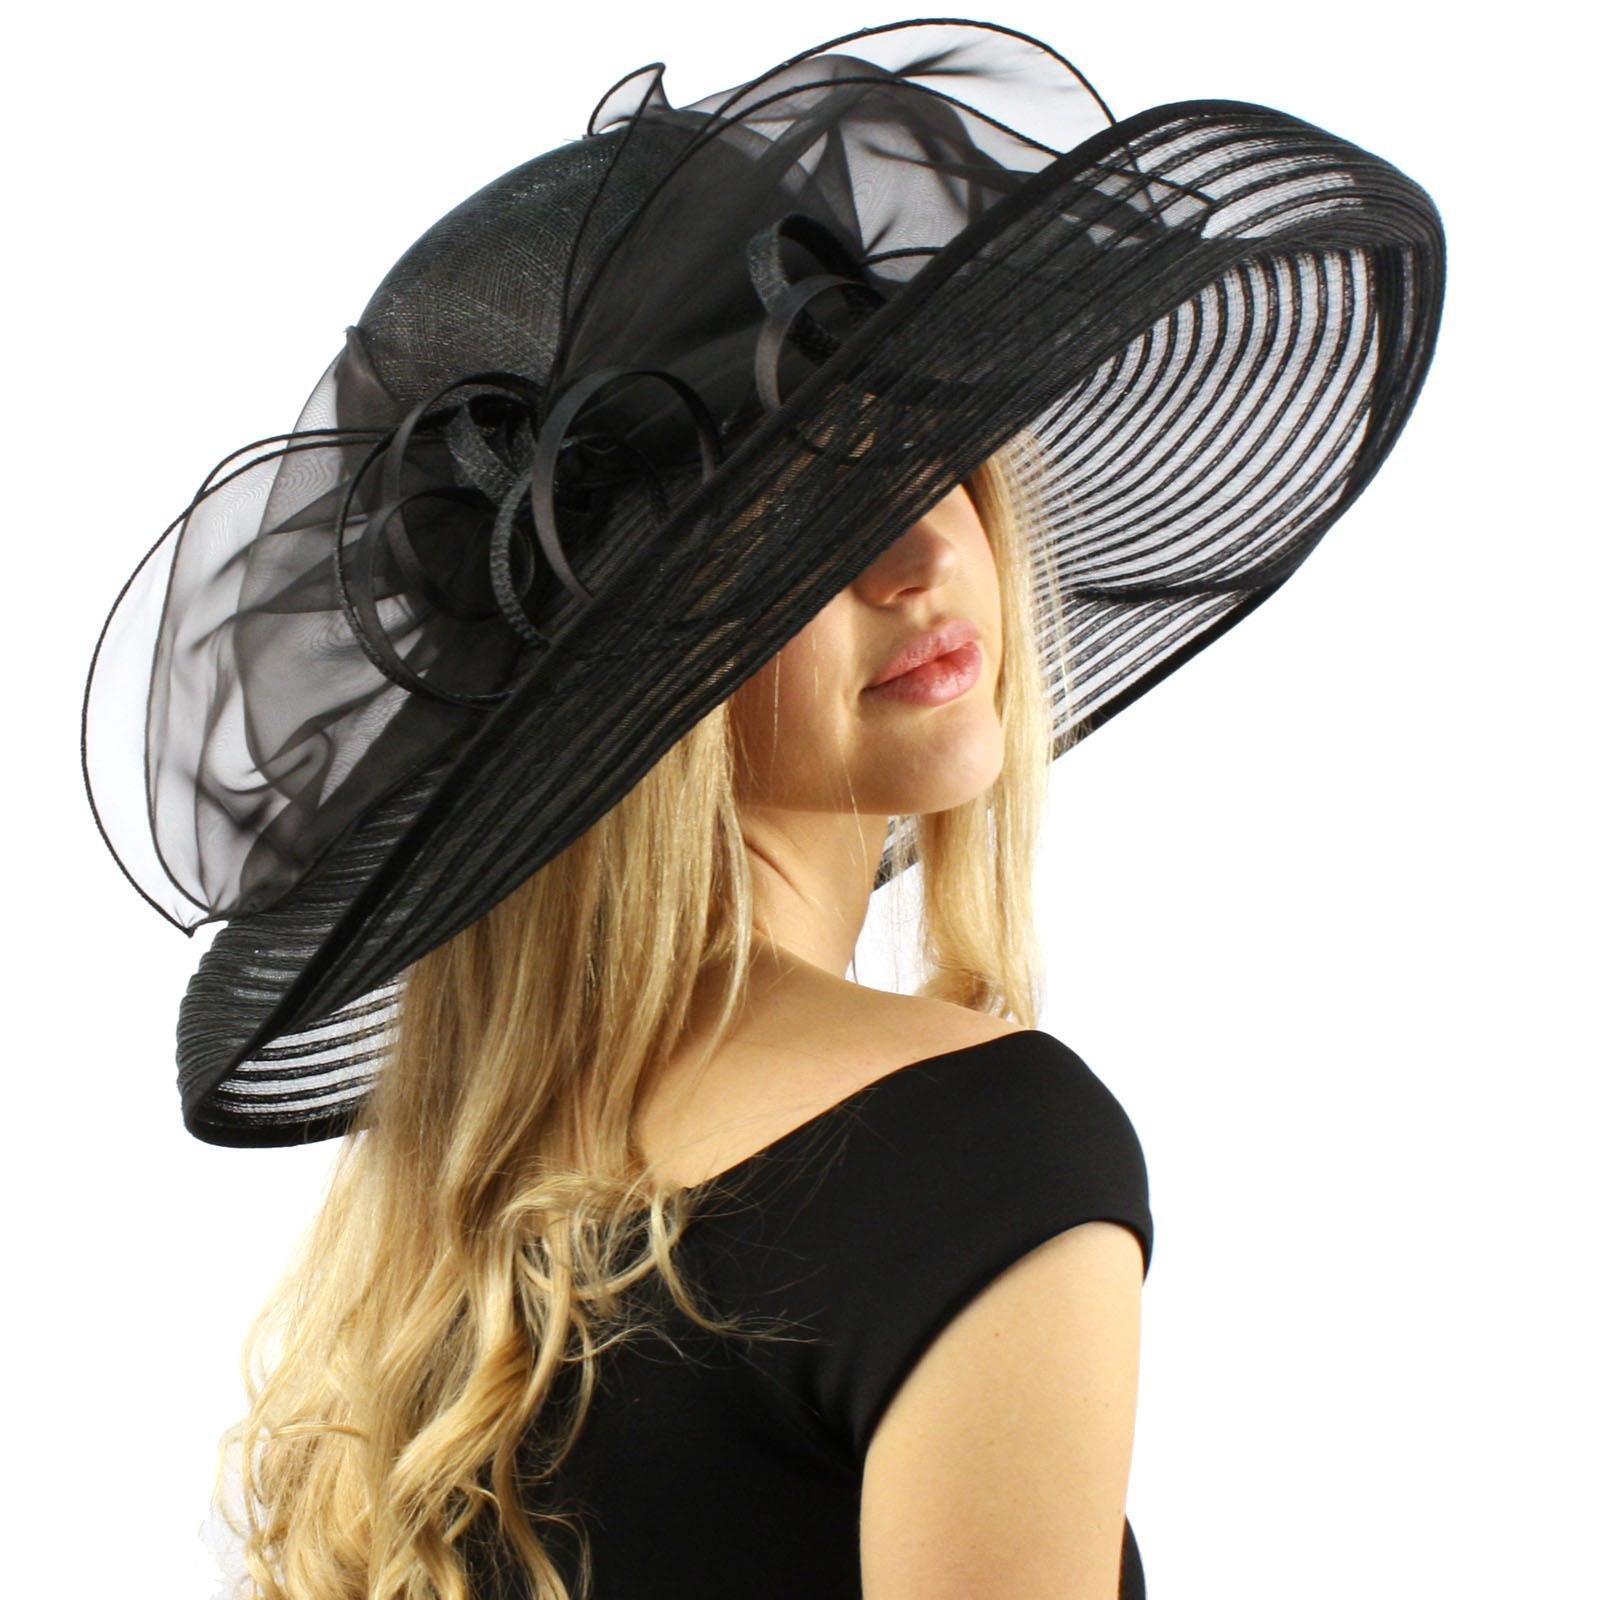 Stunning Simamay Spiral Bow Floral Kentucky Derby Floppy 7'' Brim Dress Hat Black